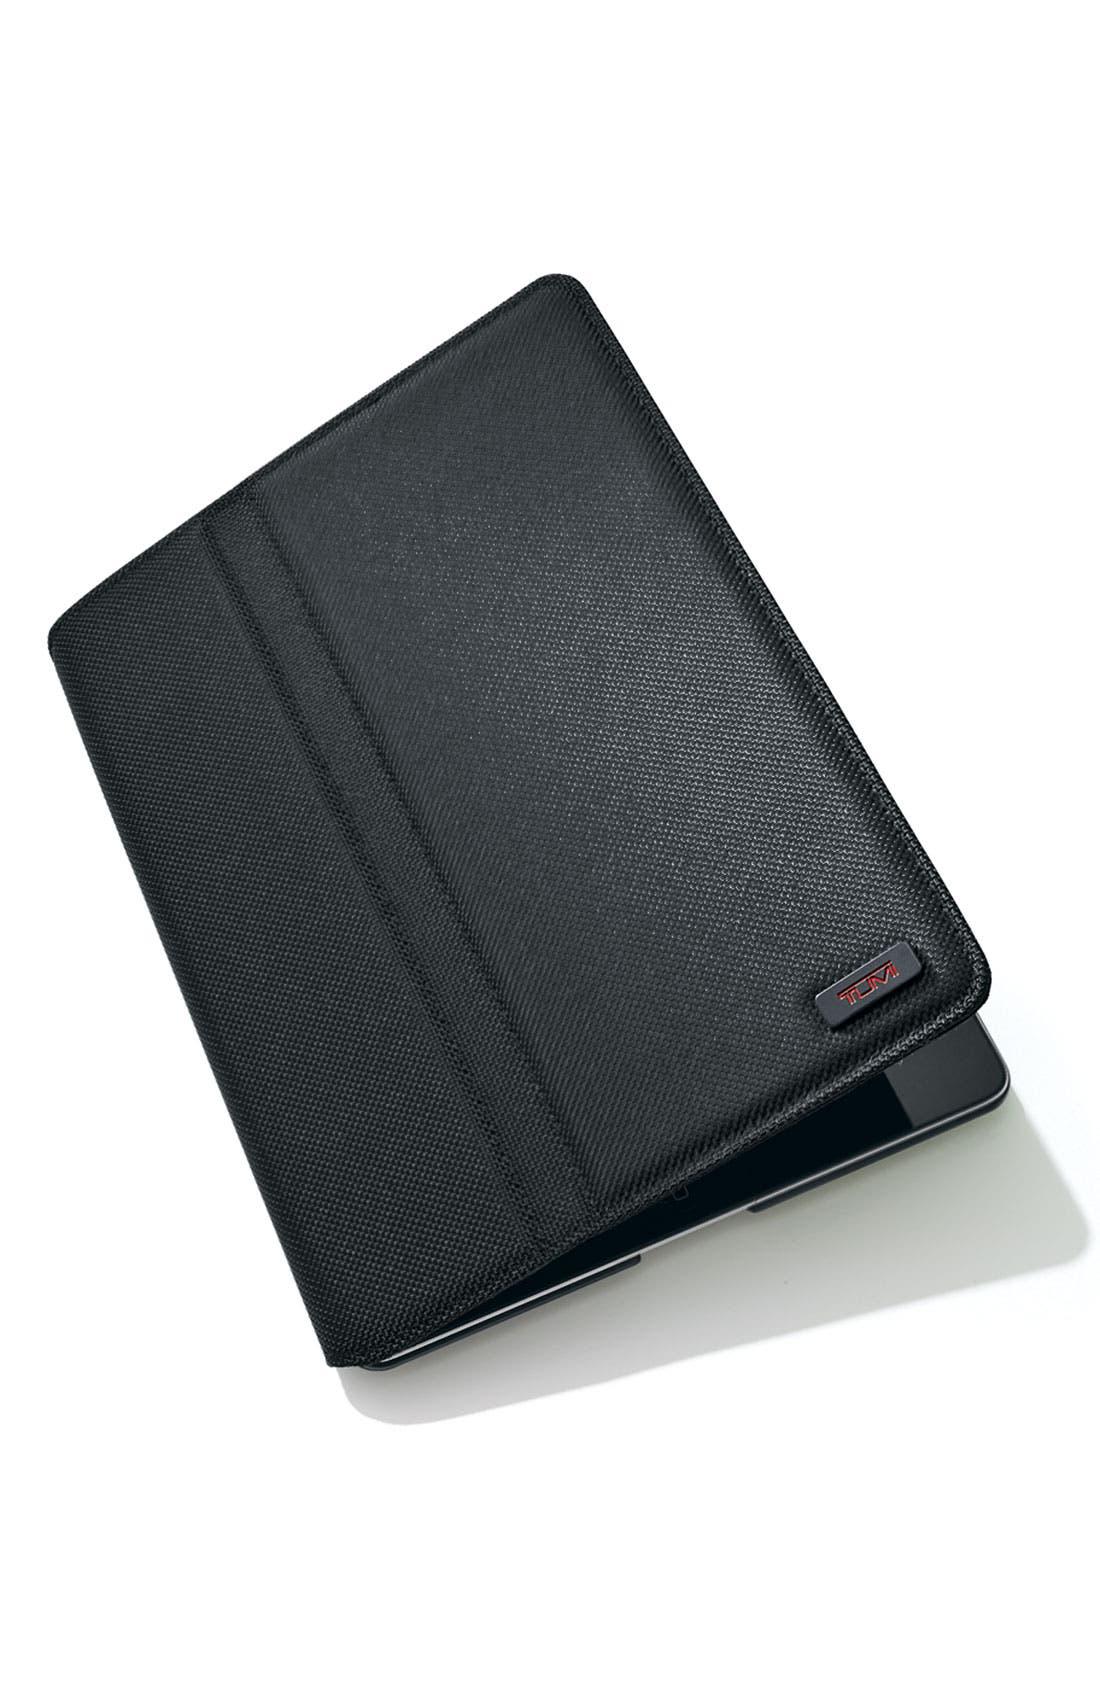 Ballistic Nylon iPad 2 Cover,                             Alternate thumbnail 5, color,